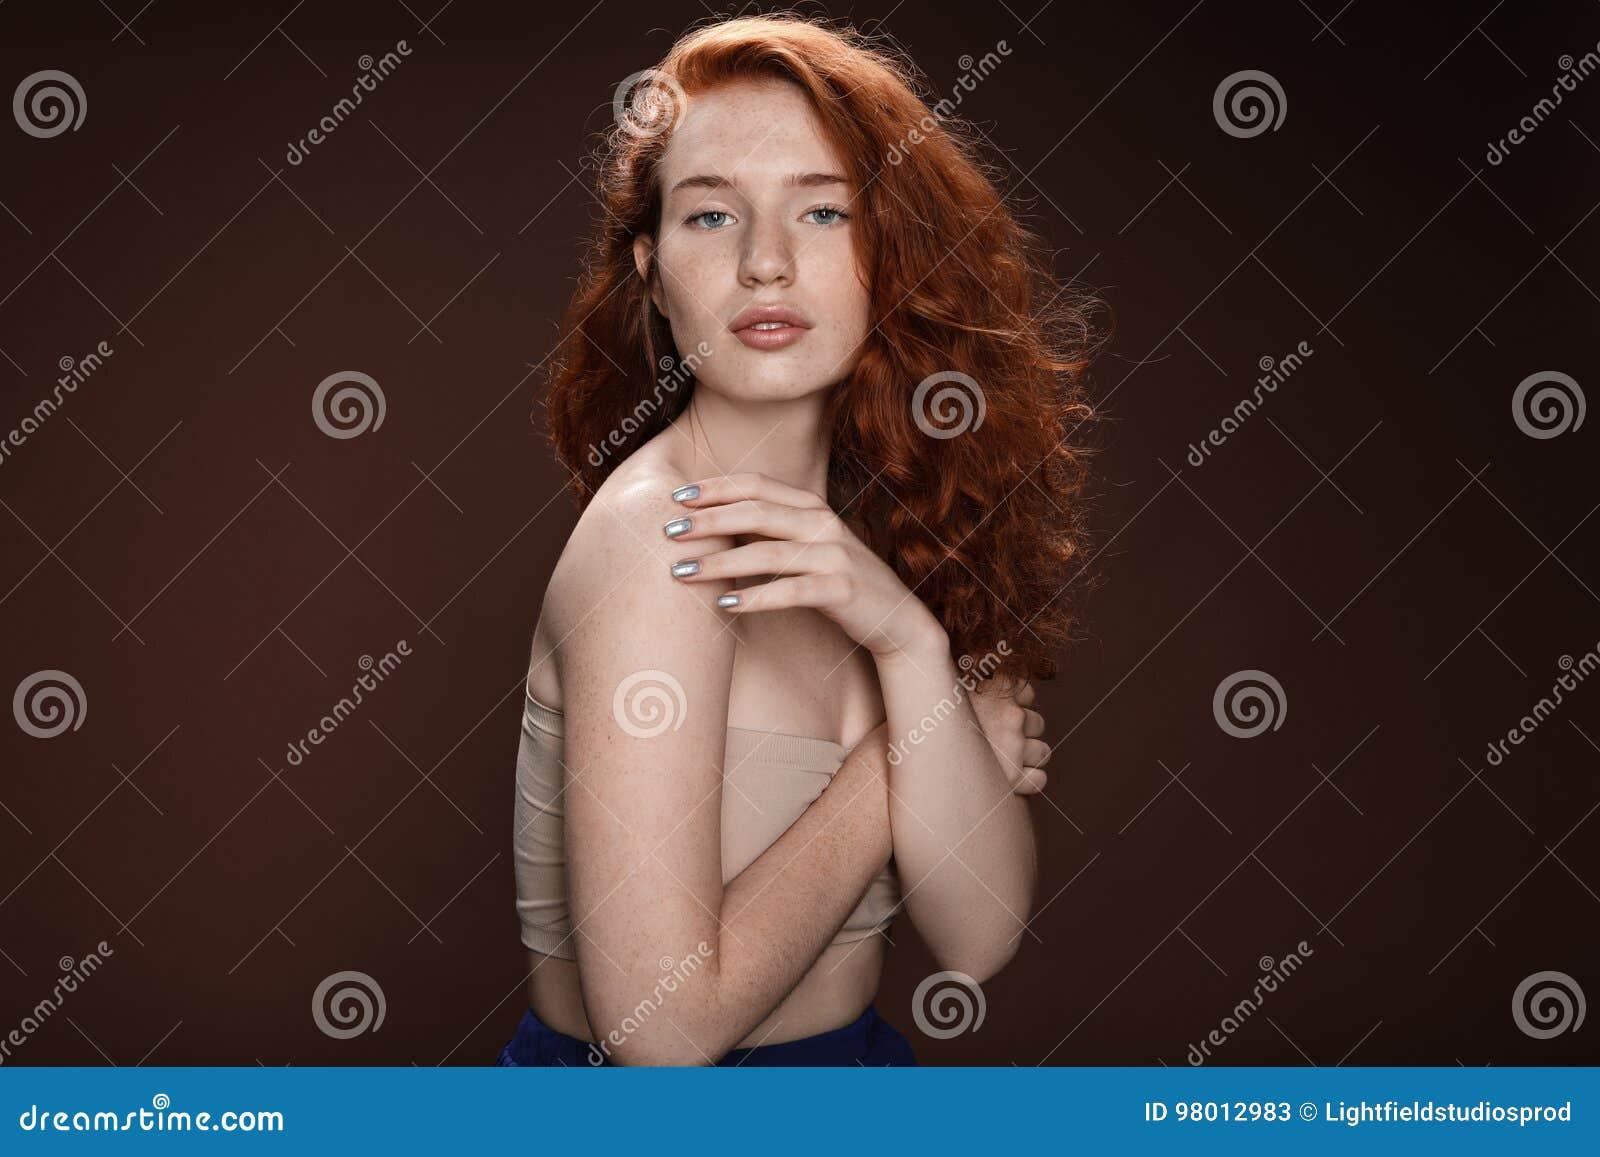 redhead-woman-posing-anal-sex-sleepwalking